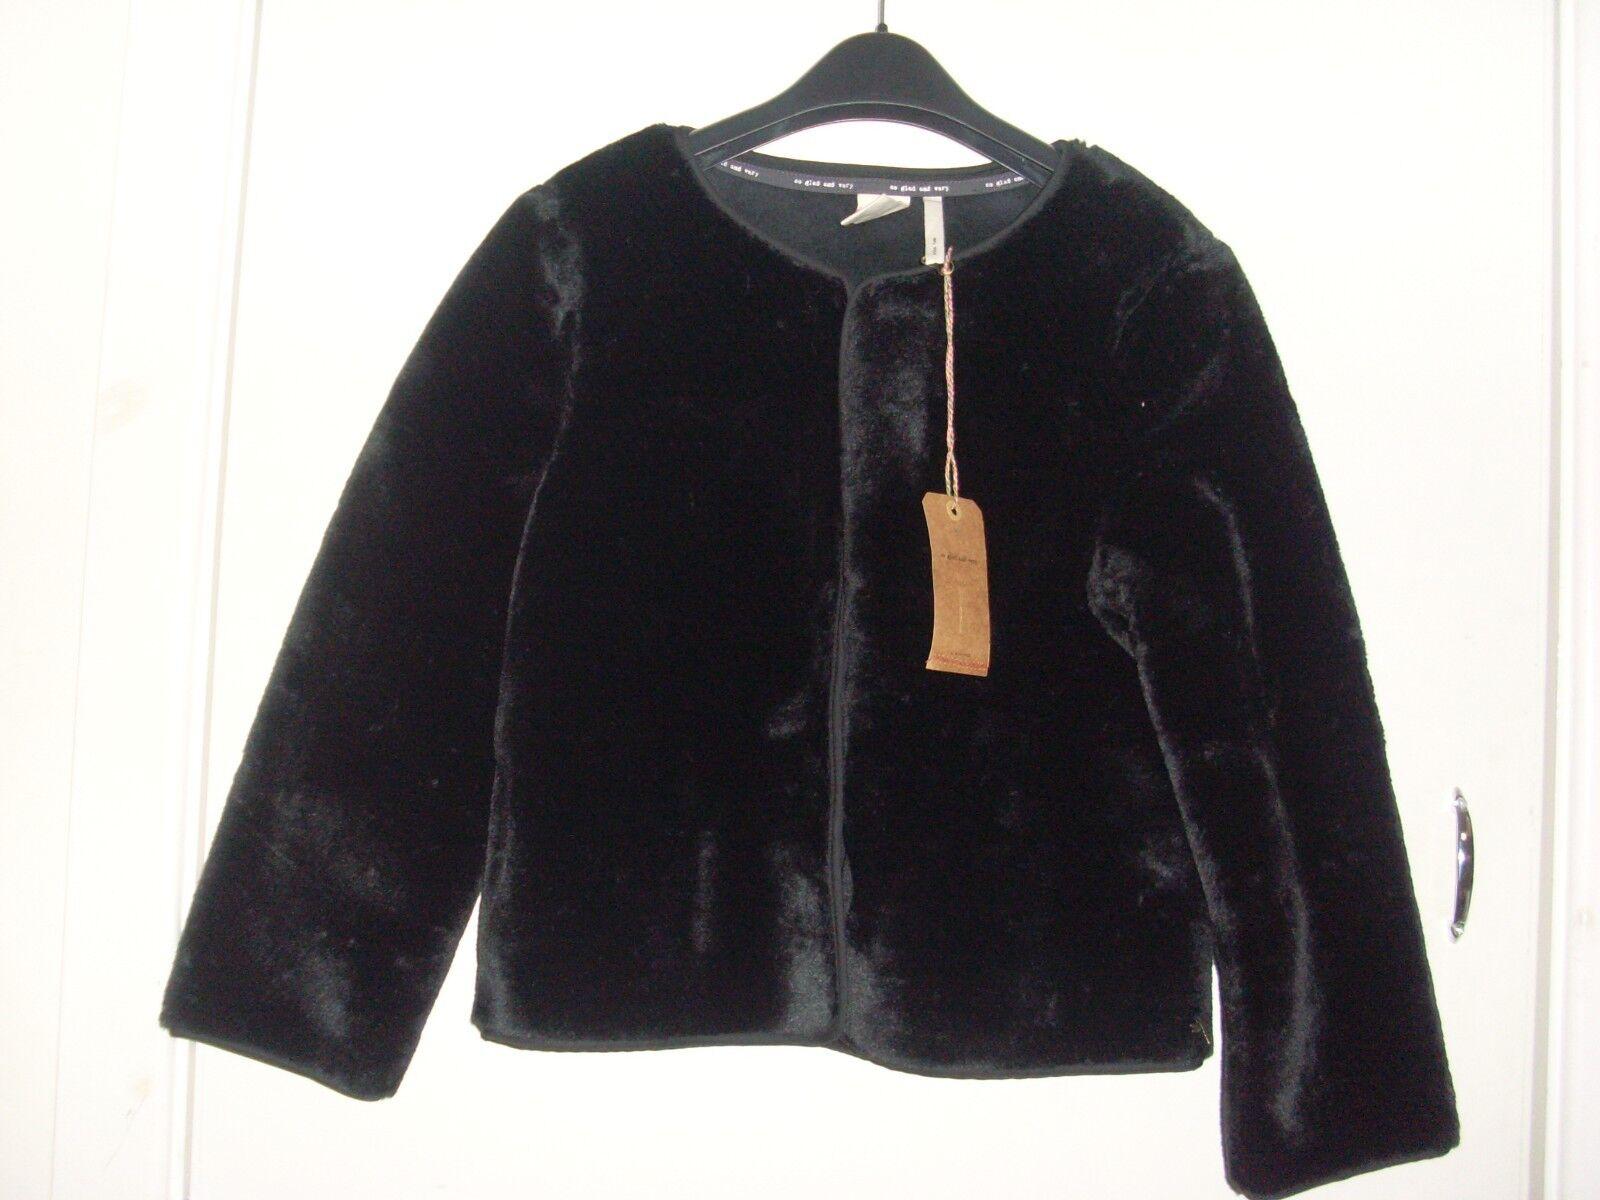 Weiß Stuff Persian Jacket damen Größe 10 rrp  LS172 TT 13